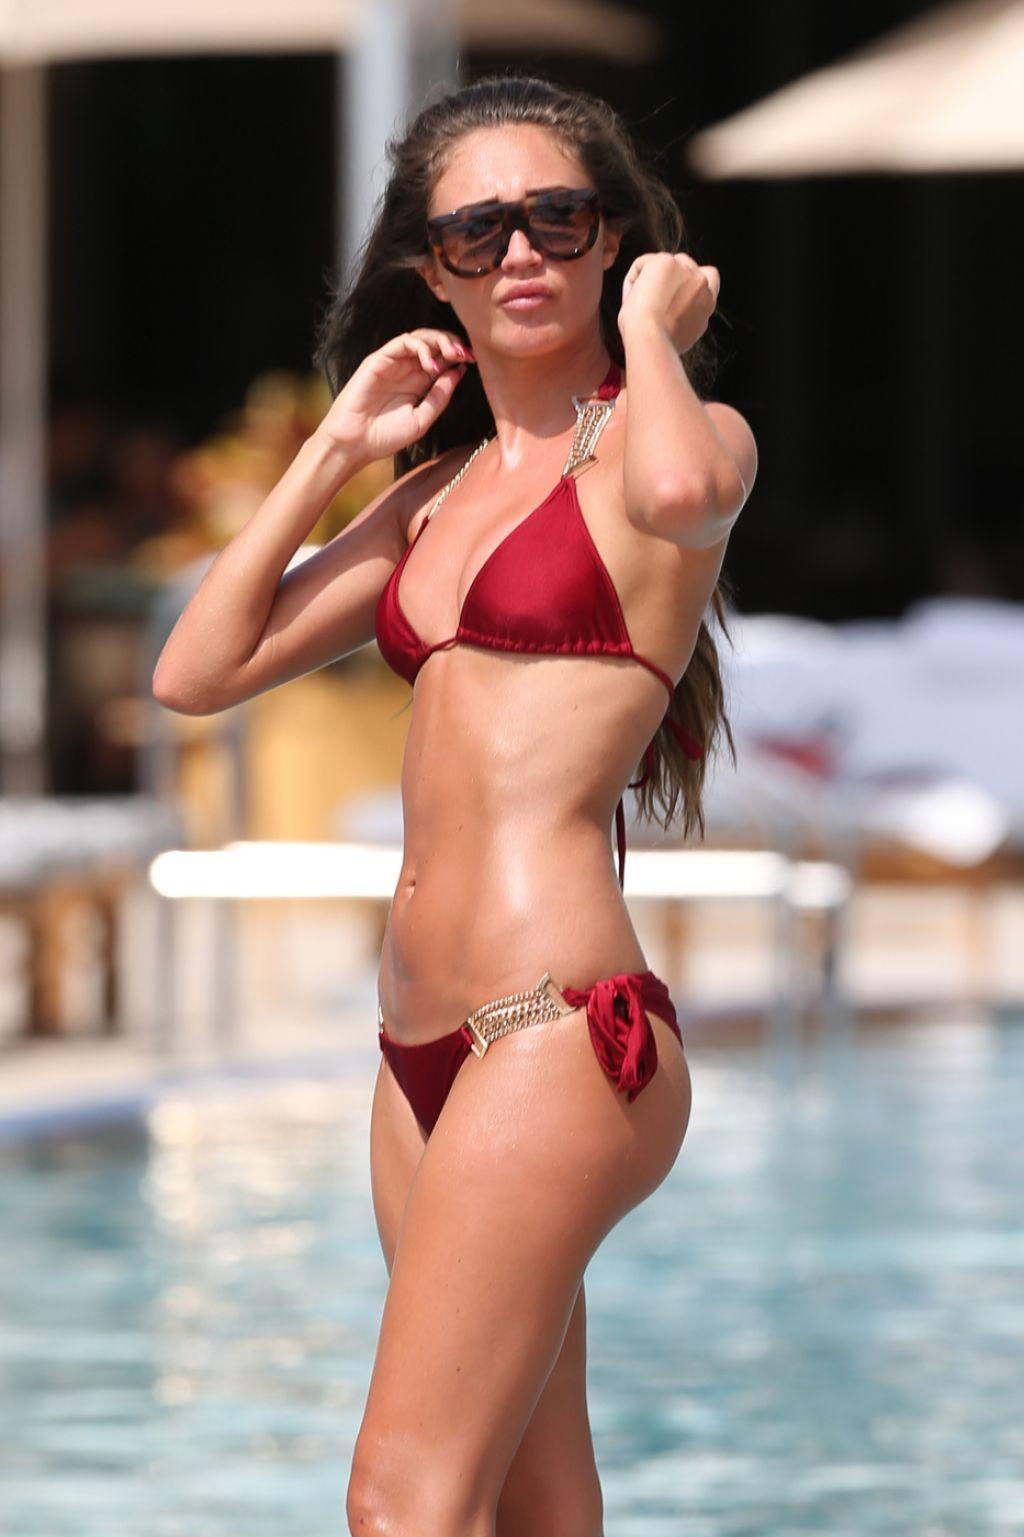 Megan McKenna Hot in Red Bikini - Miami, April 2016